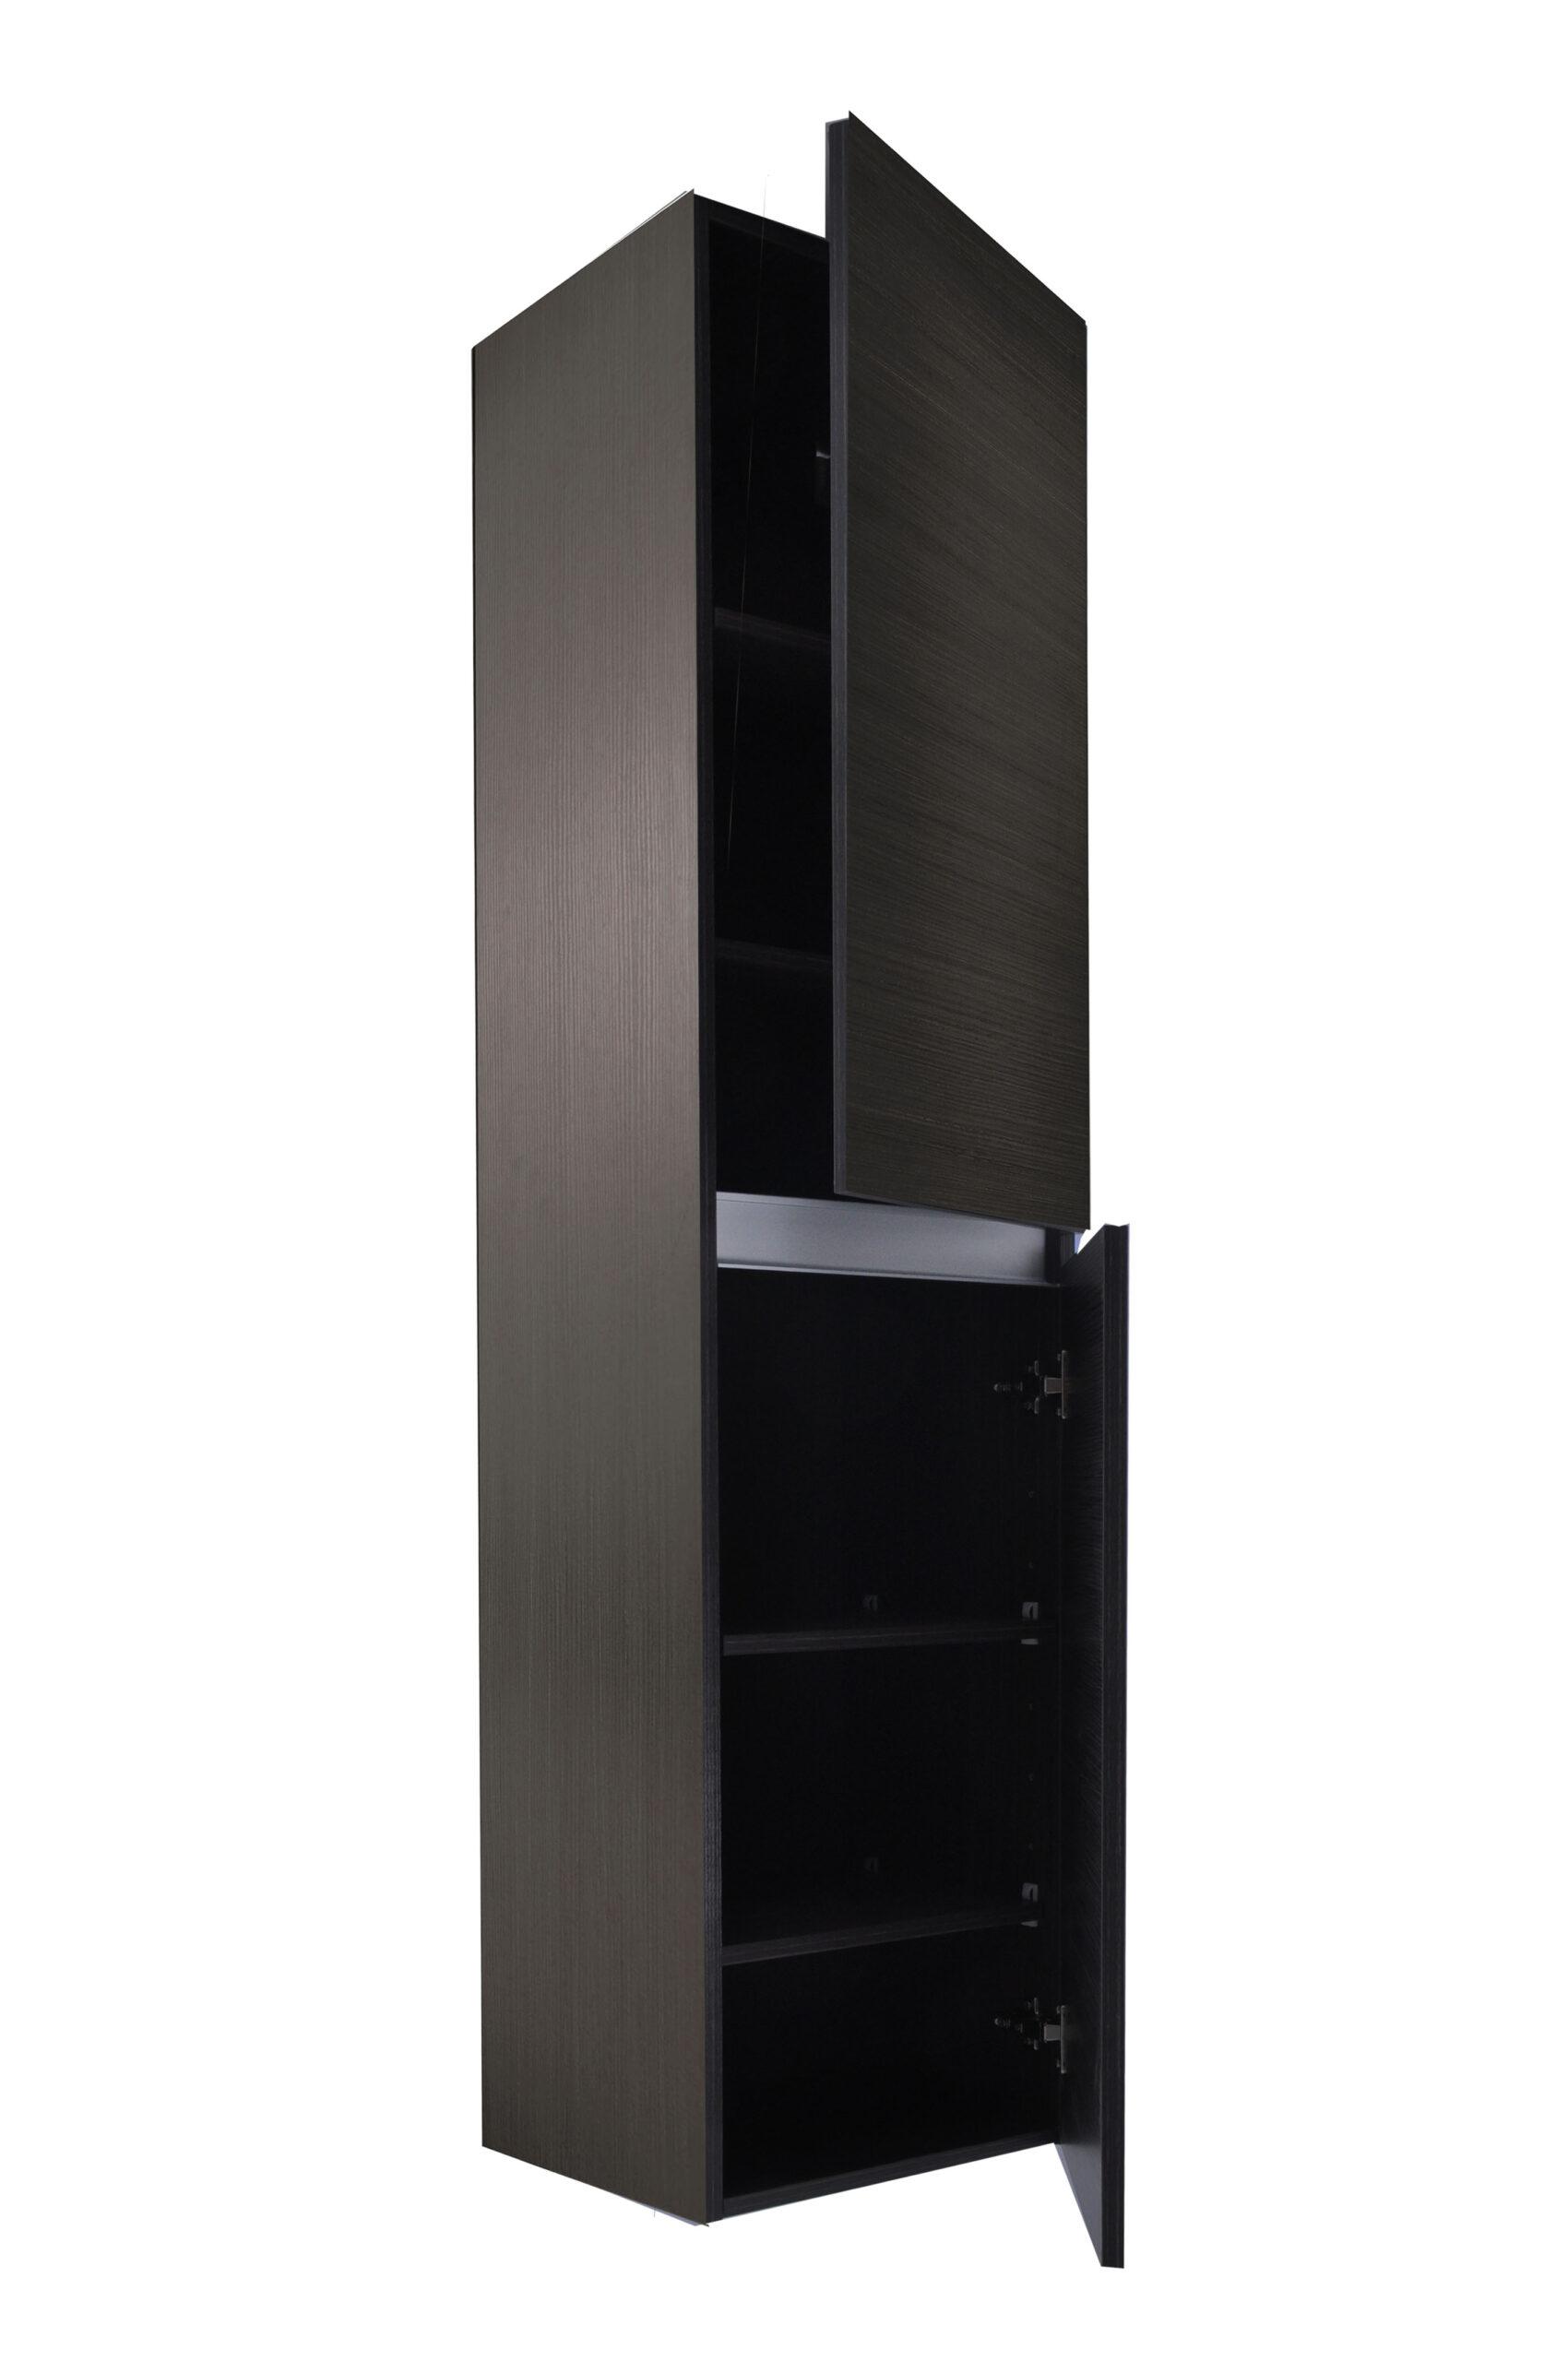 Wiesbaden Vision kolomkast met 2 deuren 160x35x35 cm, houtnerf grijs